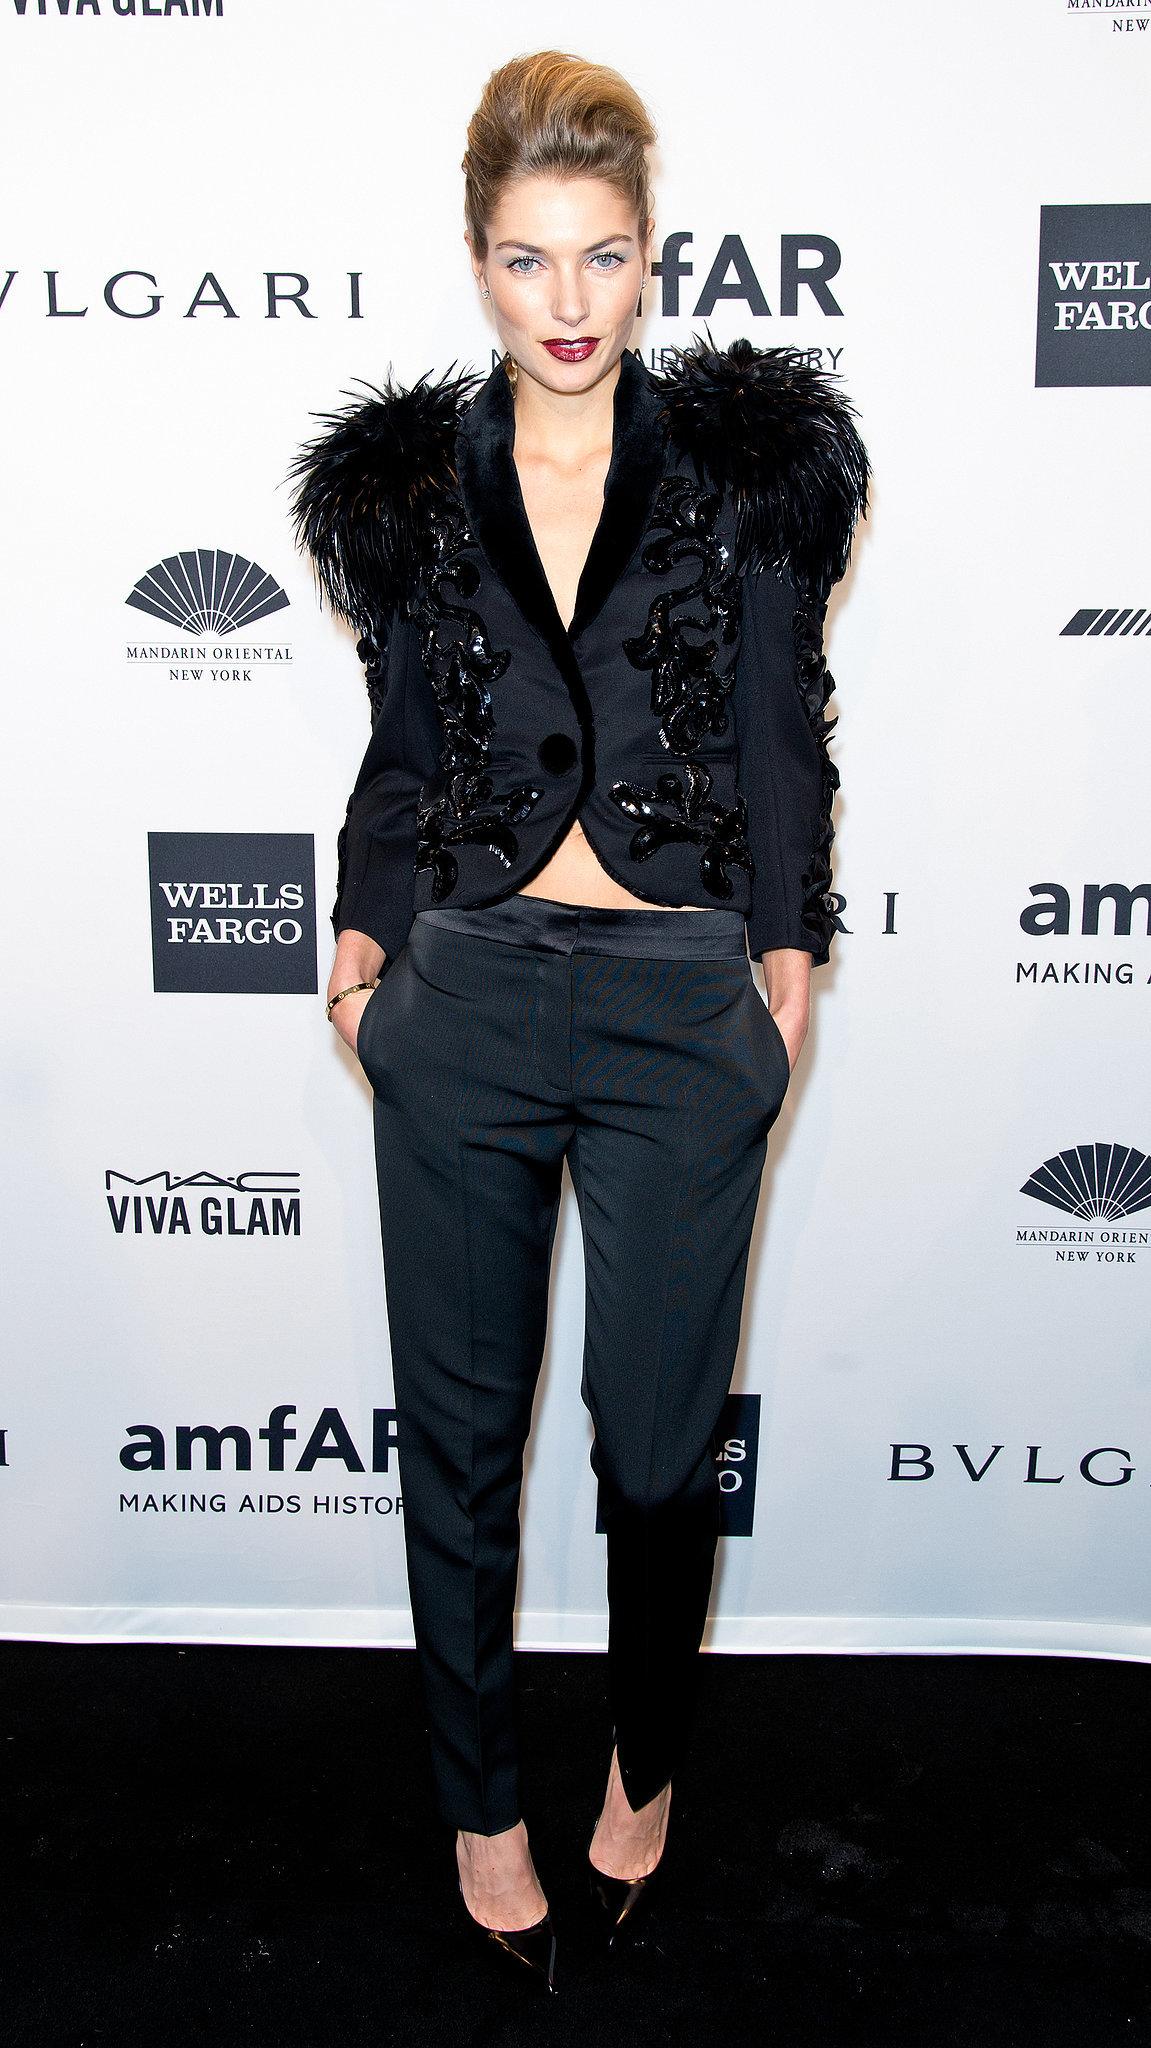 Jessica Hart, wearing Louis Vuitton, at amfAR's New York Gala.